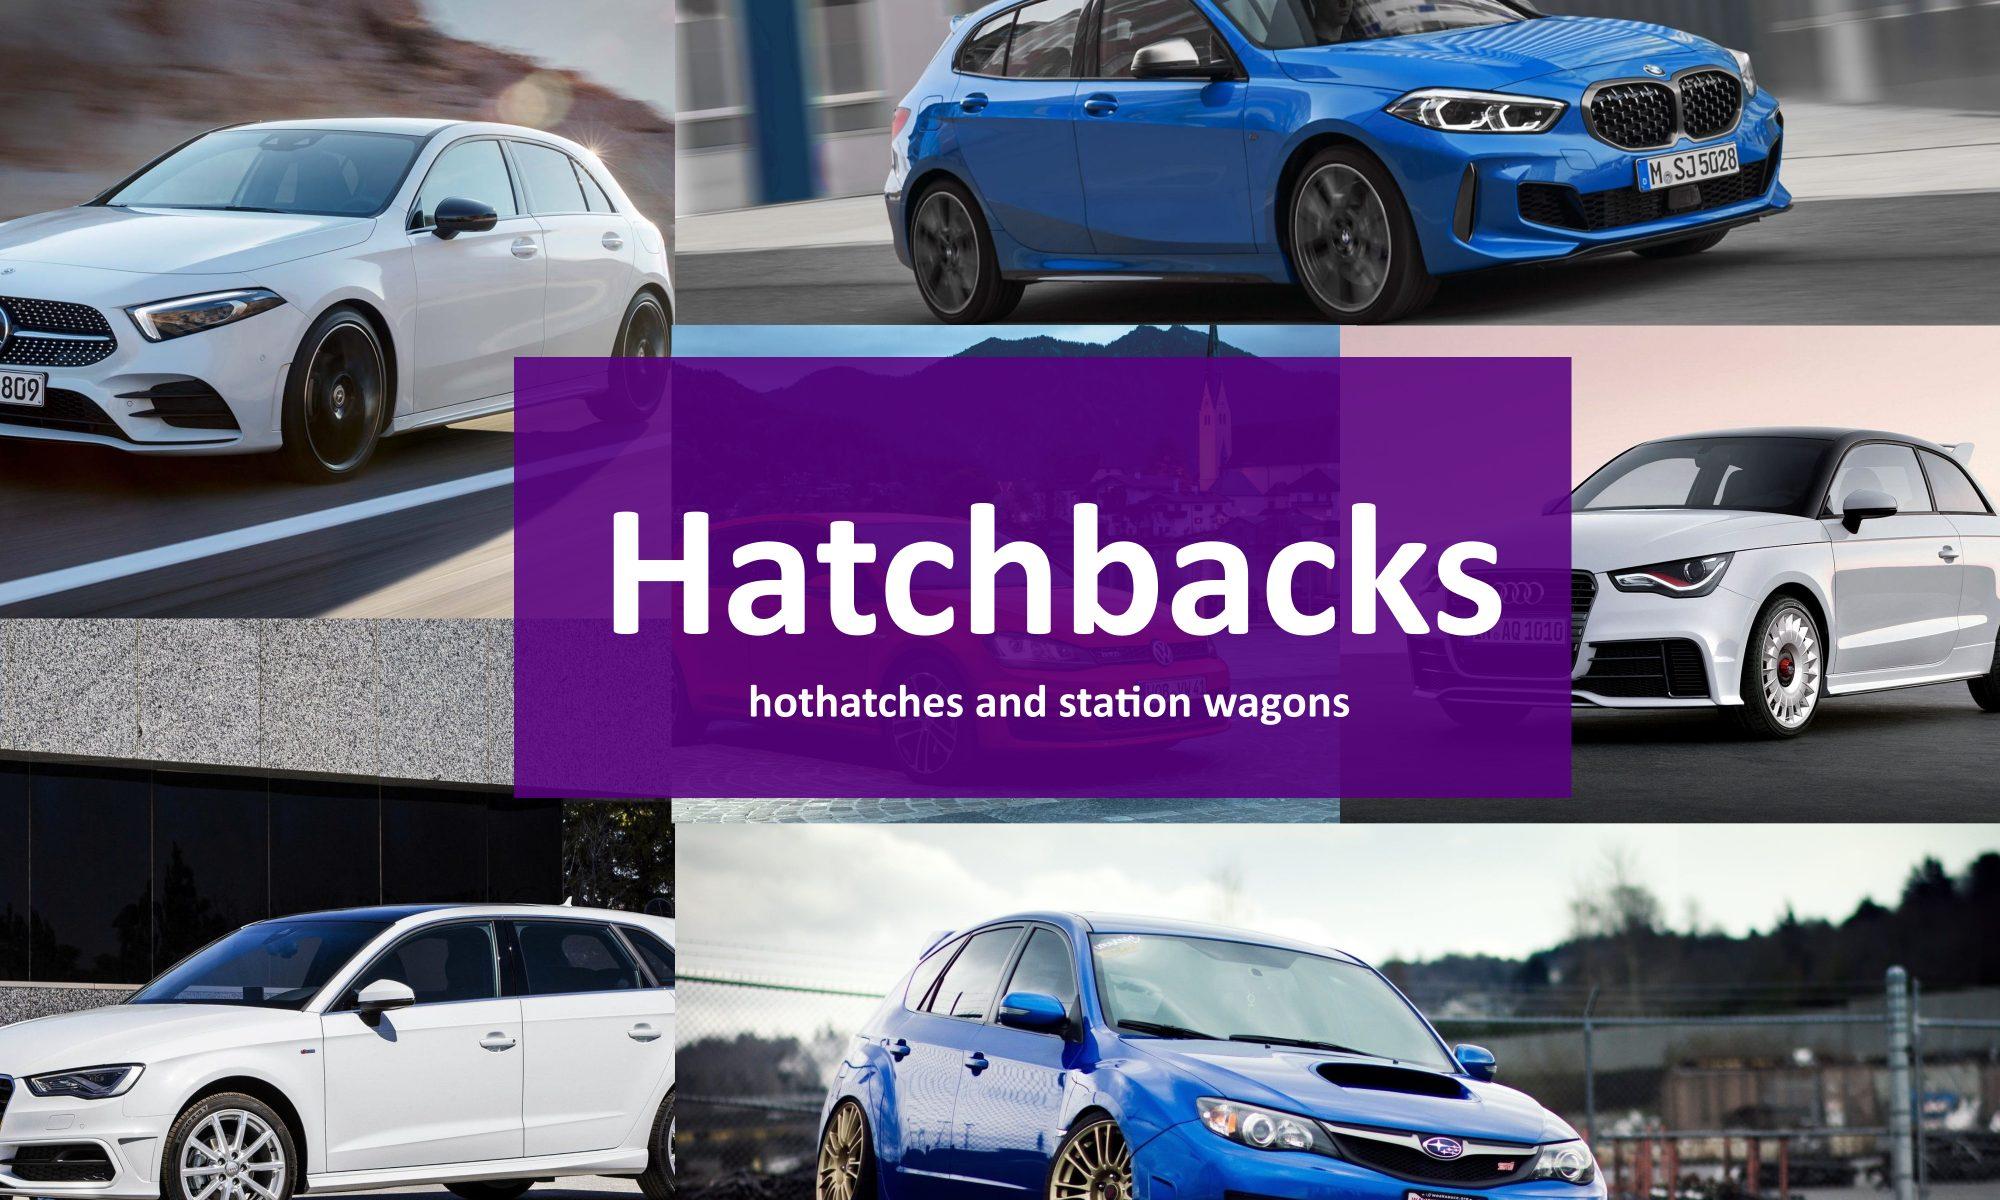 hatchbacks2 2000x1200 - Top selling hatchbacks in Kenya